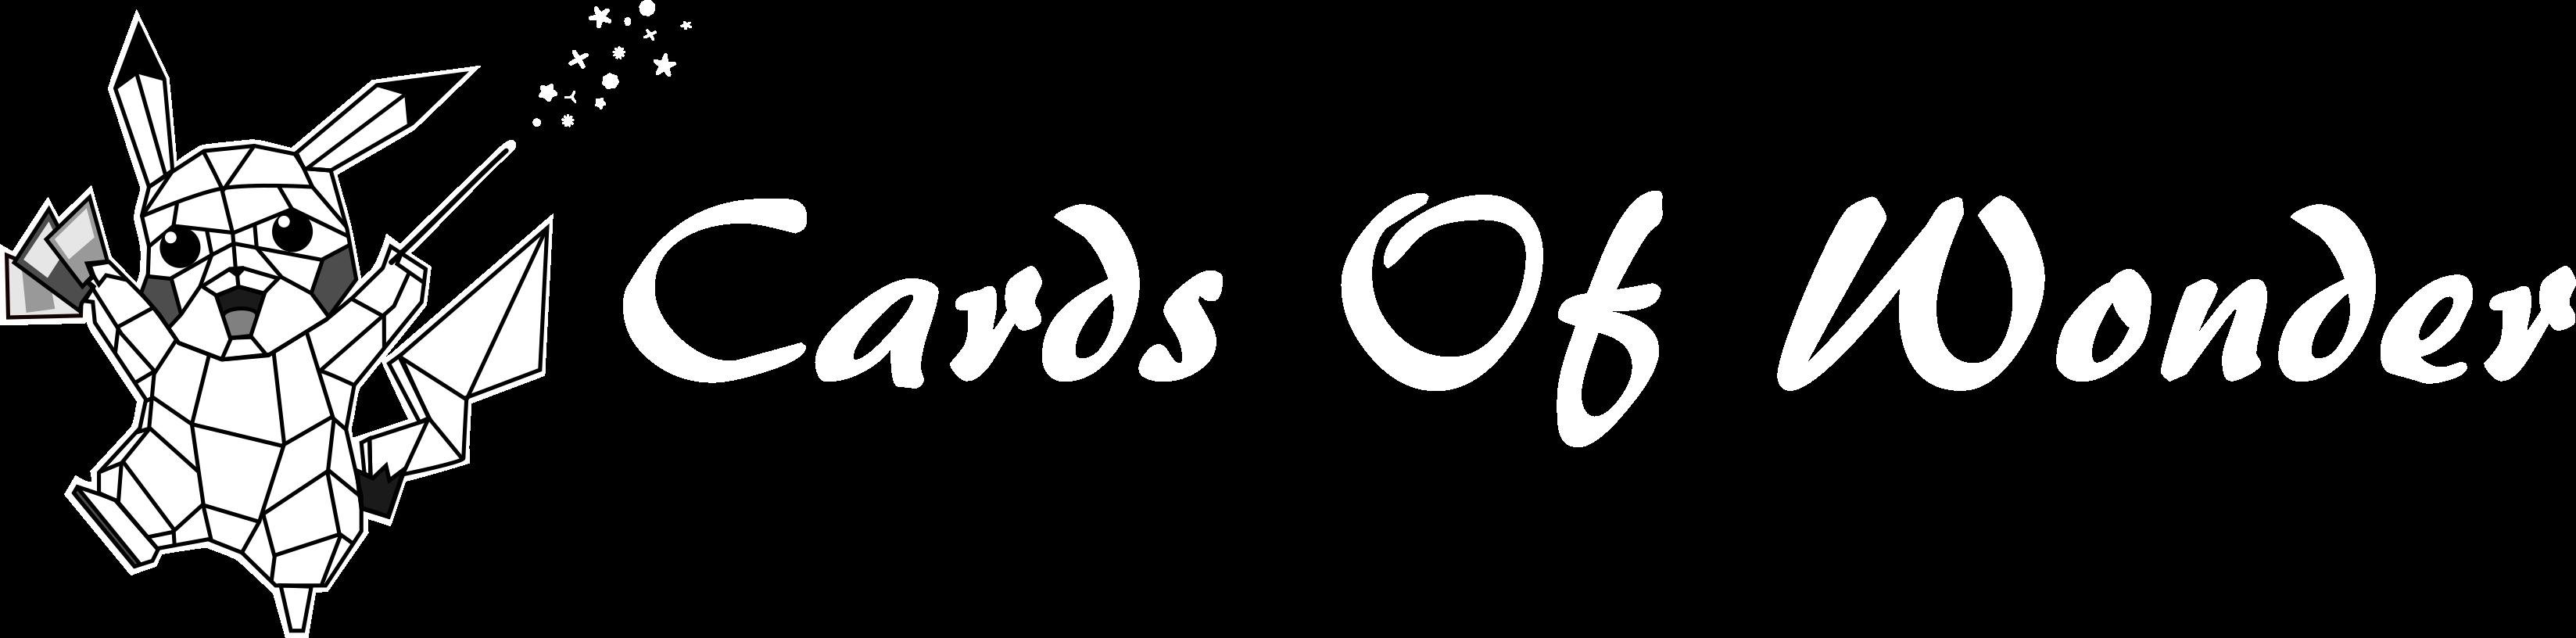 www.cardsofwonder.be